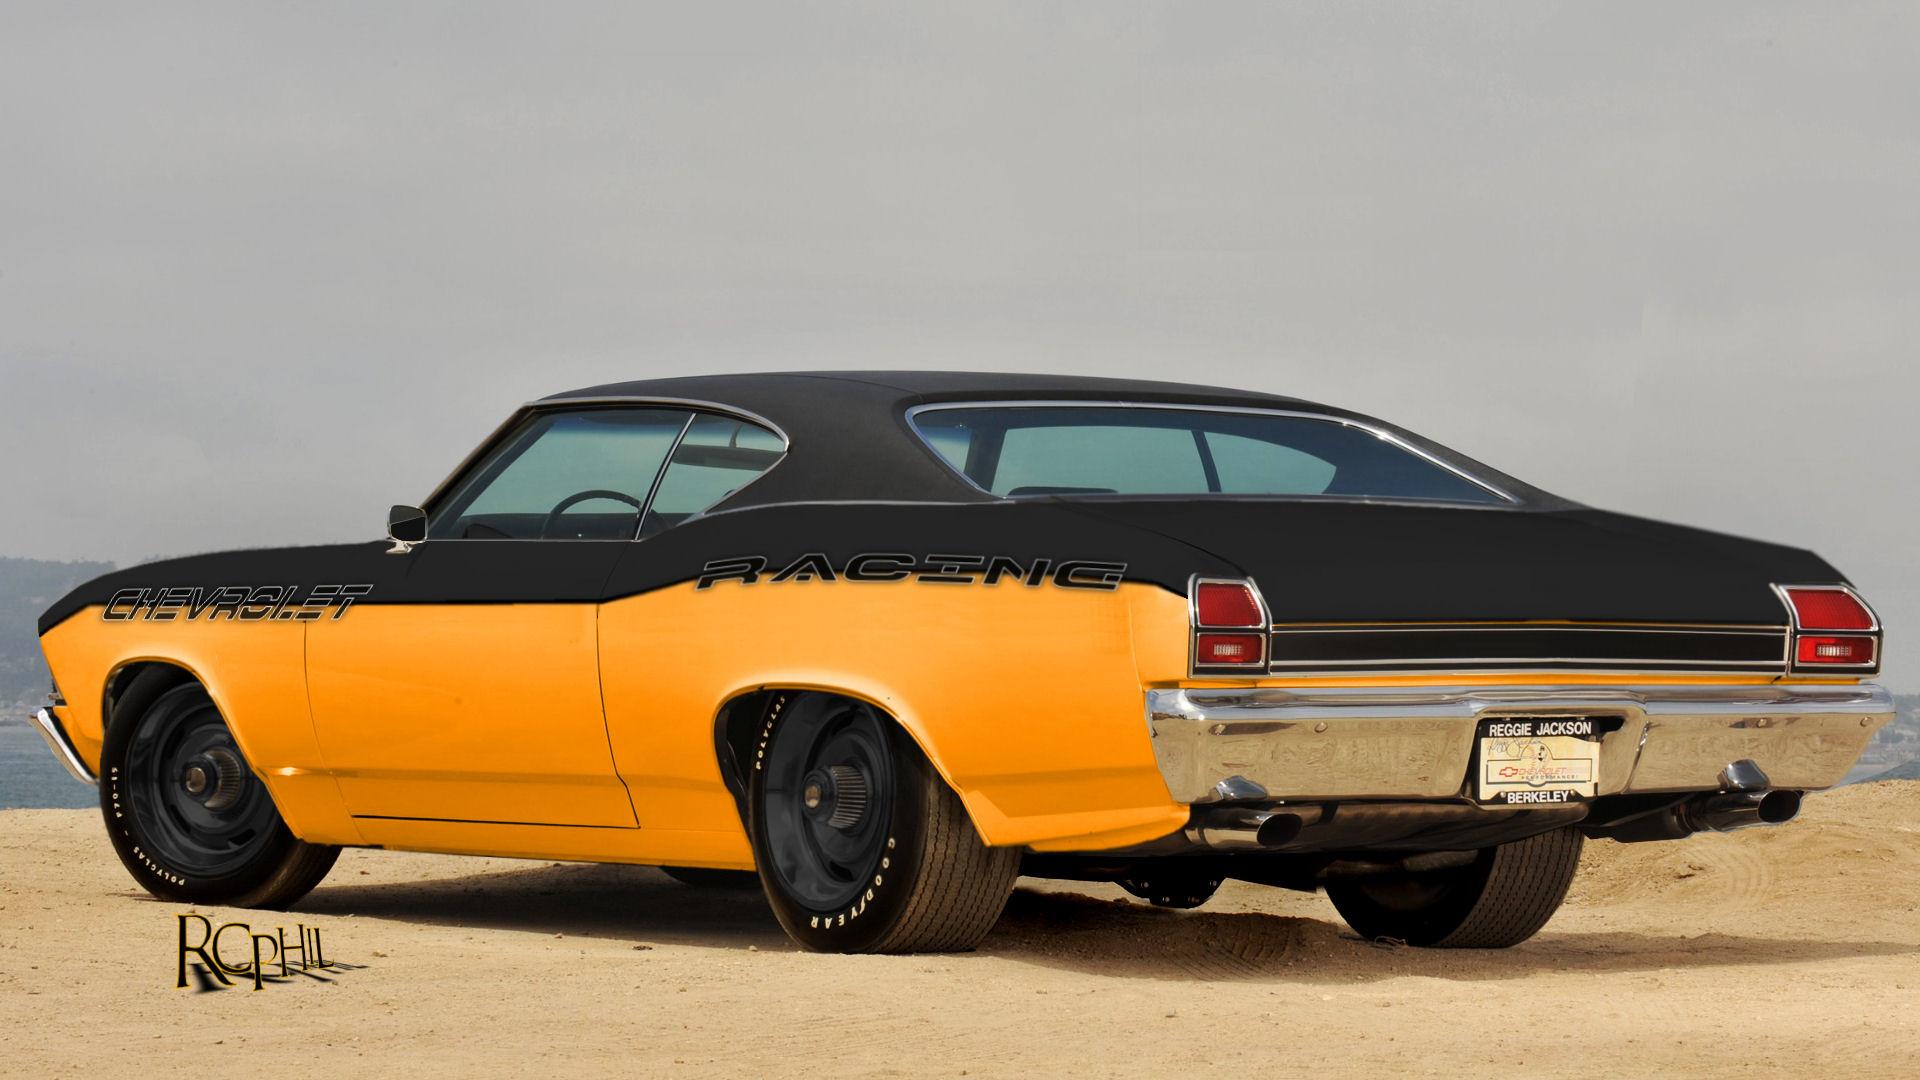 … 1969 Chevrolet Chevelle yenko sc 427 1900×1080 by RCPHIL